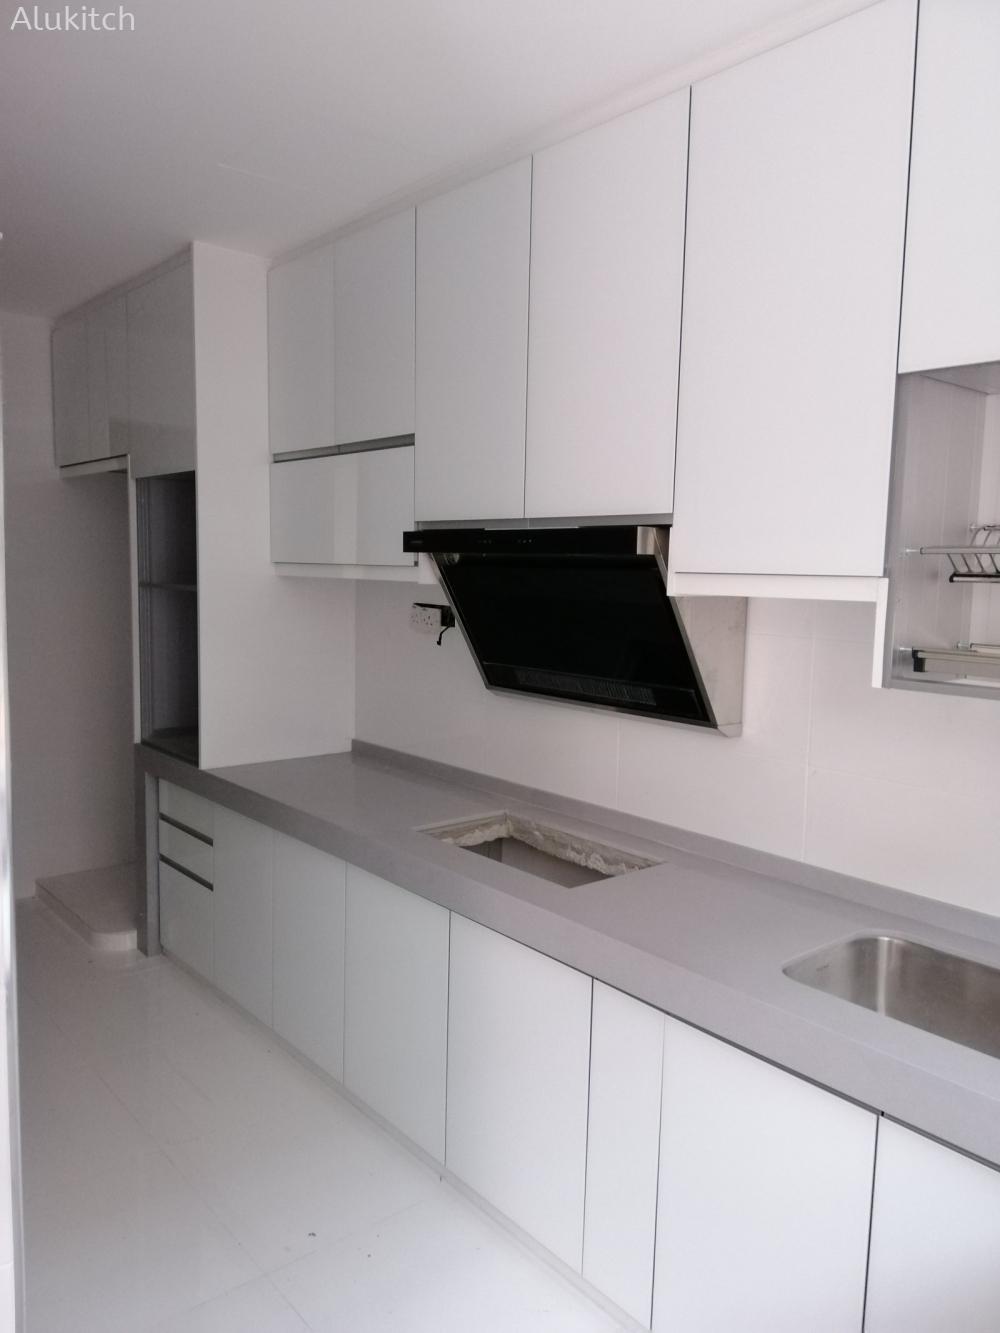 Aluminium Kitchen Cabinet Seremban Ns Aluminium Wardrobe Supply Selangor Kl Bathroom Cabinet Supplier Malaysia Alukitch Sdn Bhd